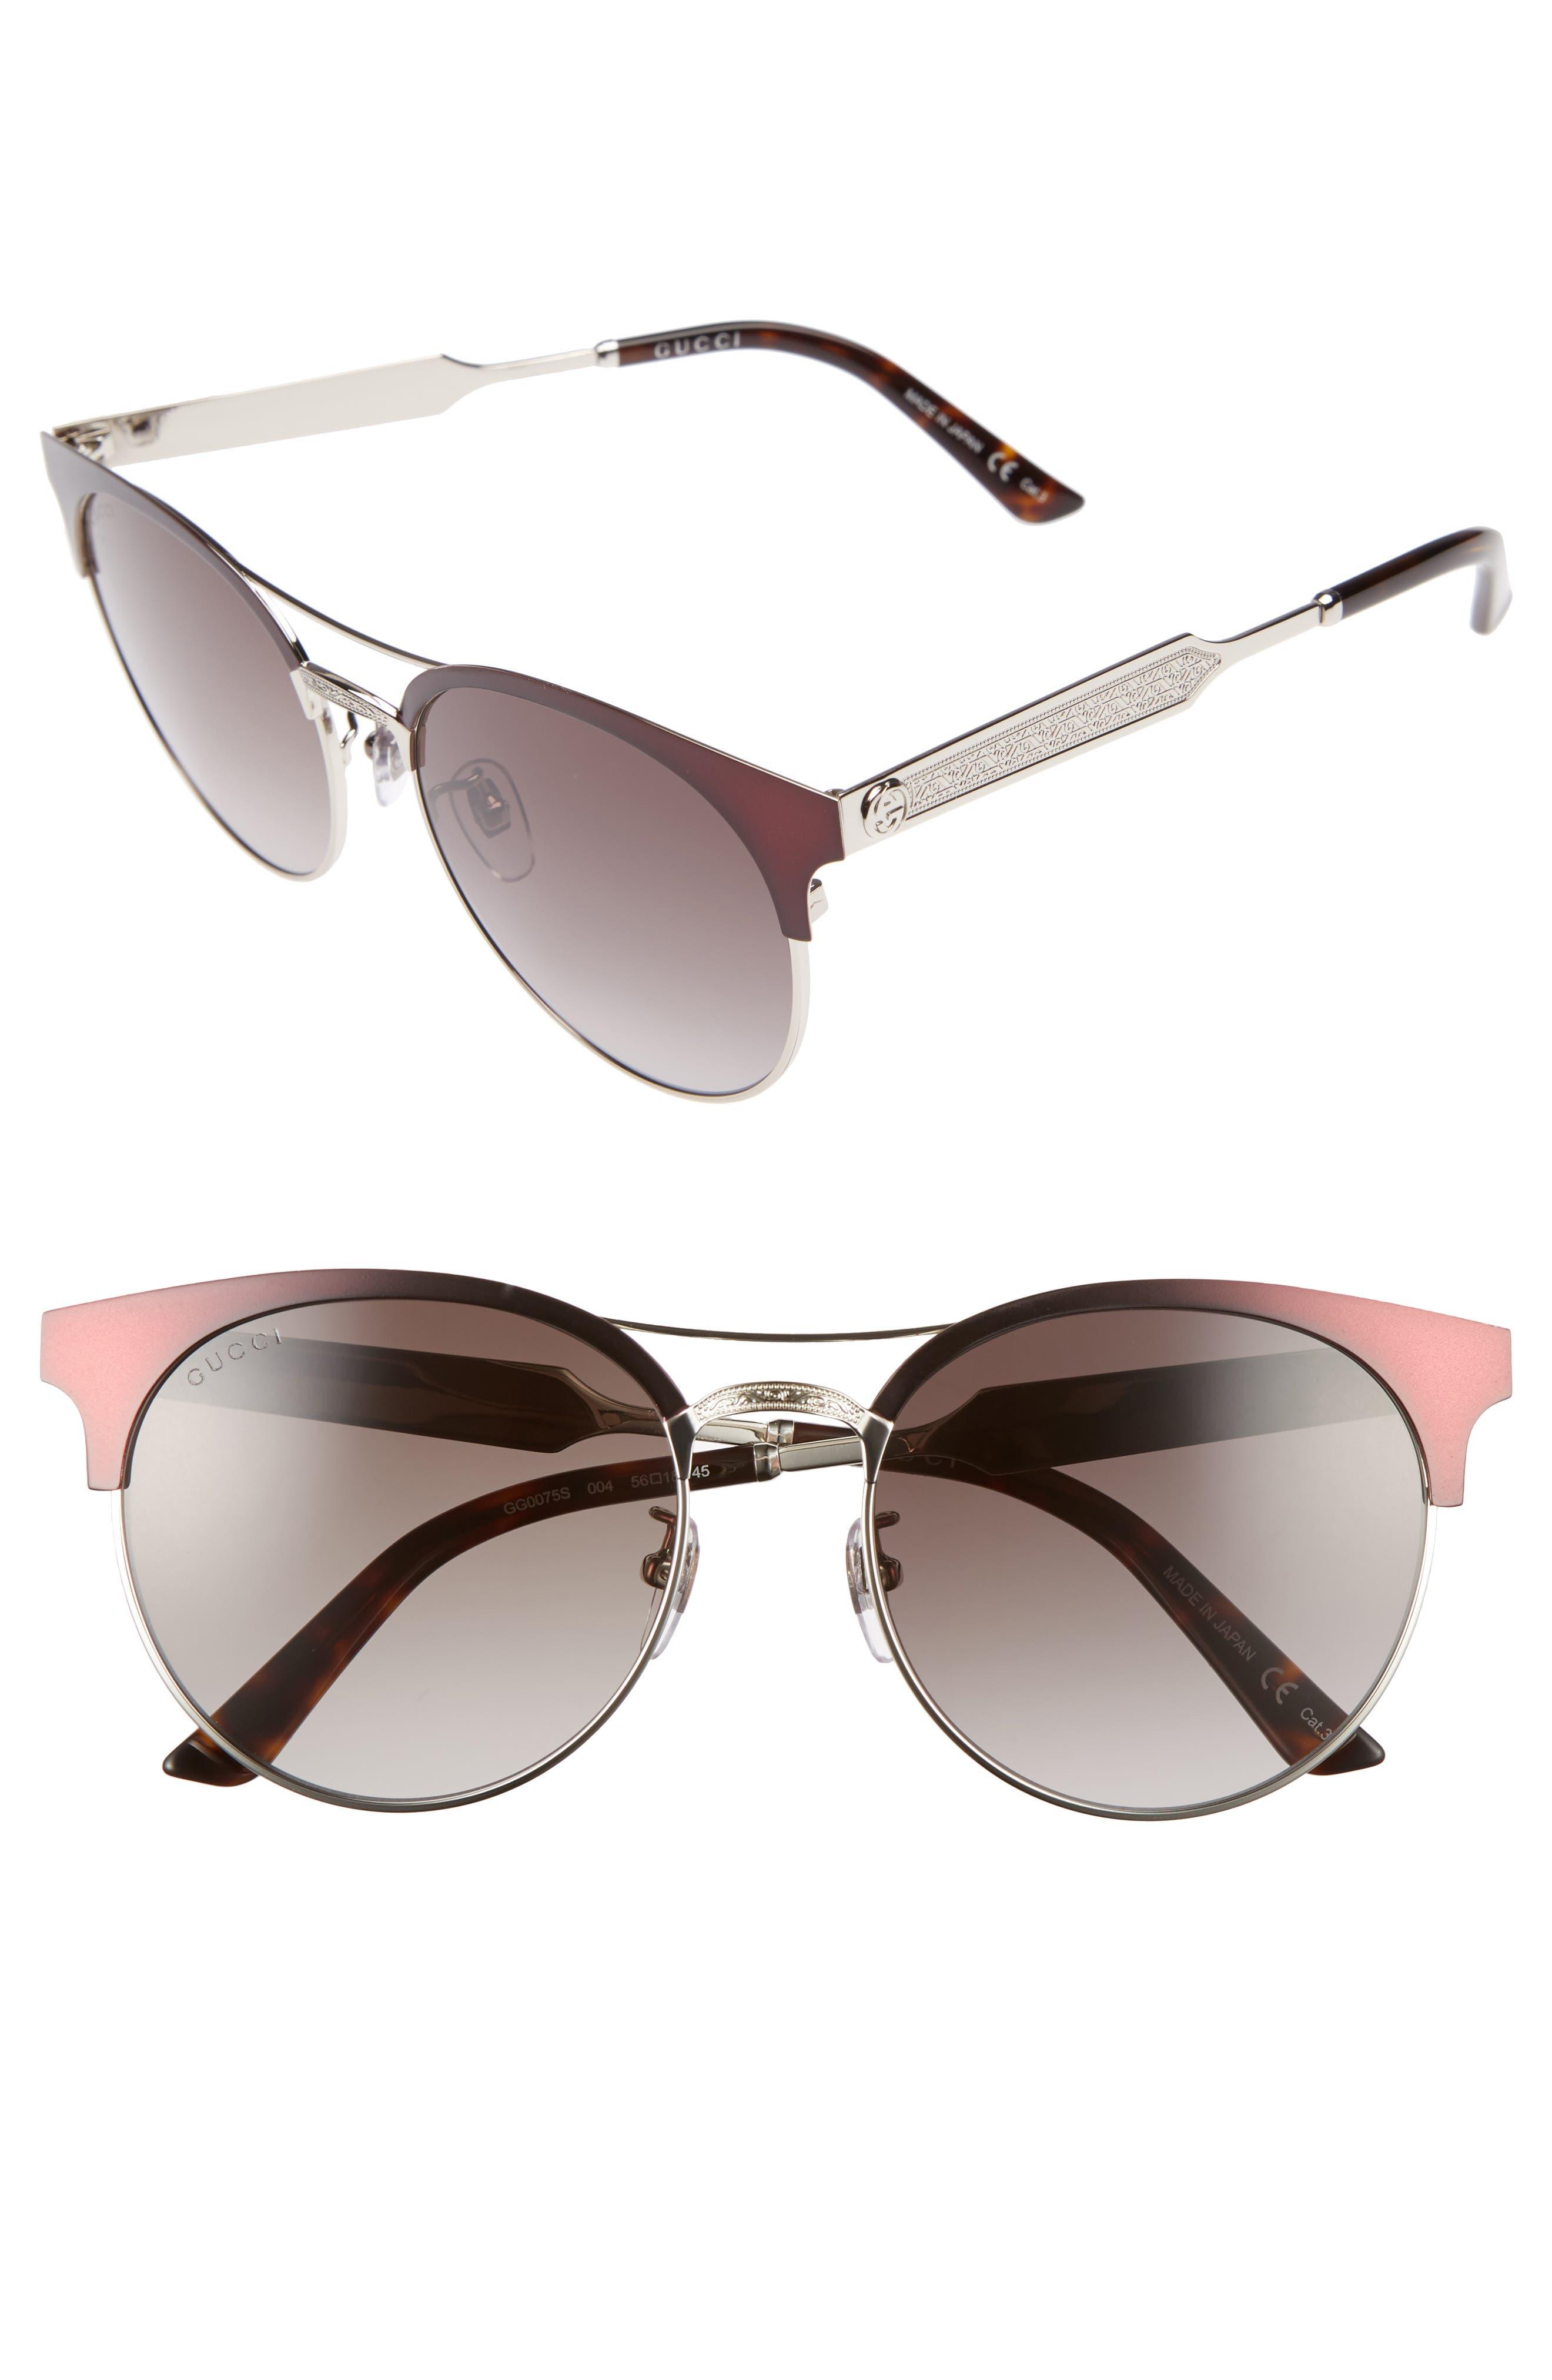 56mm Retro Sunglasses,                             Main thumbnail 3, color,